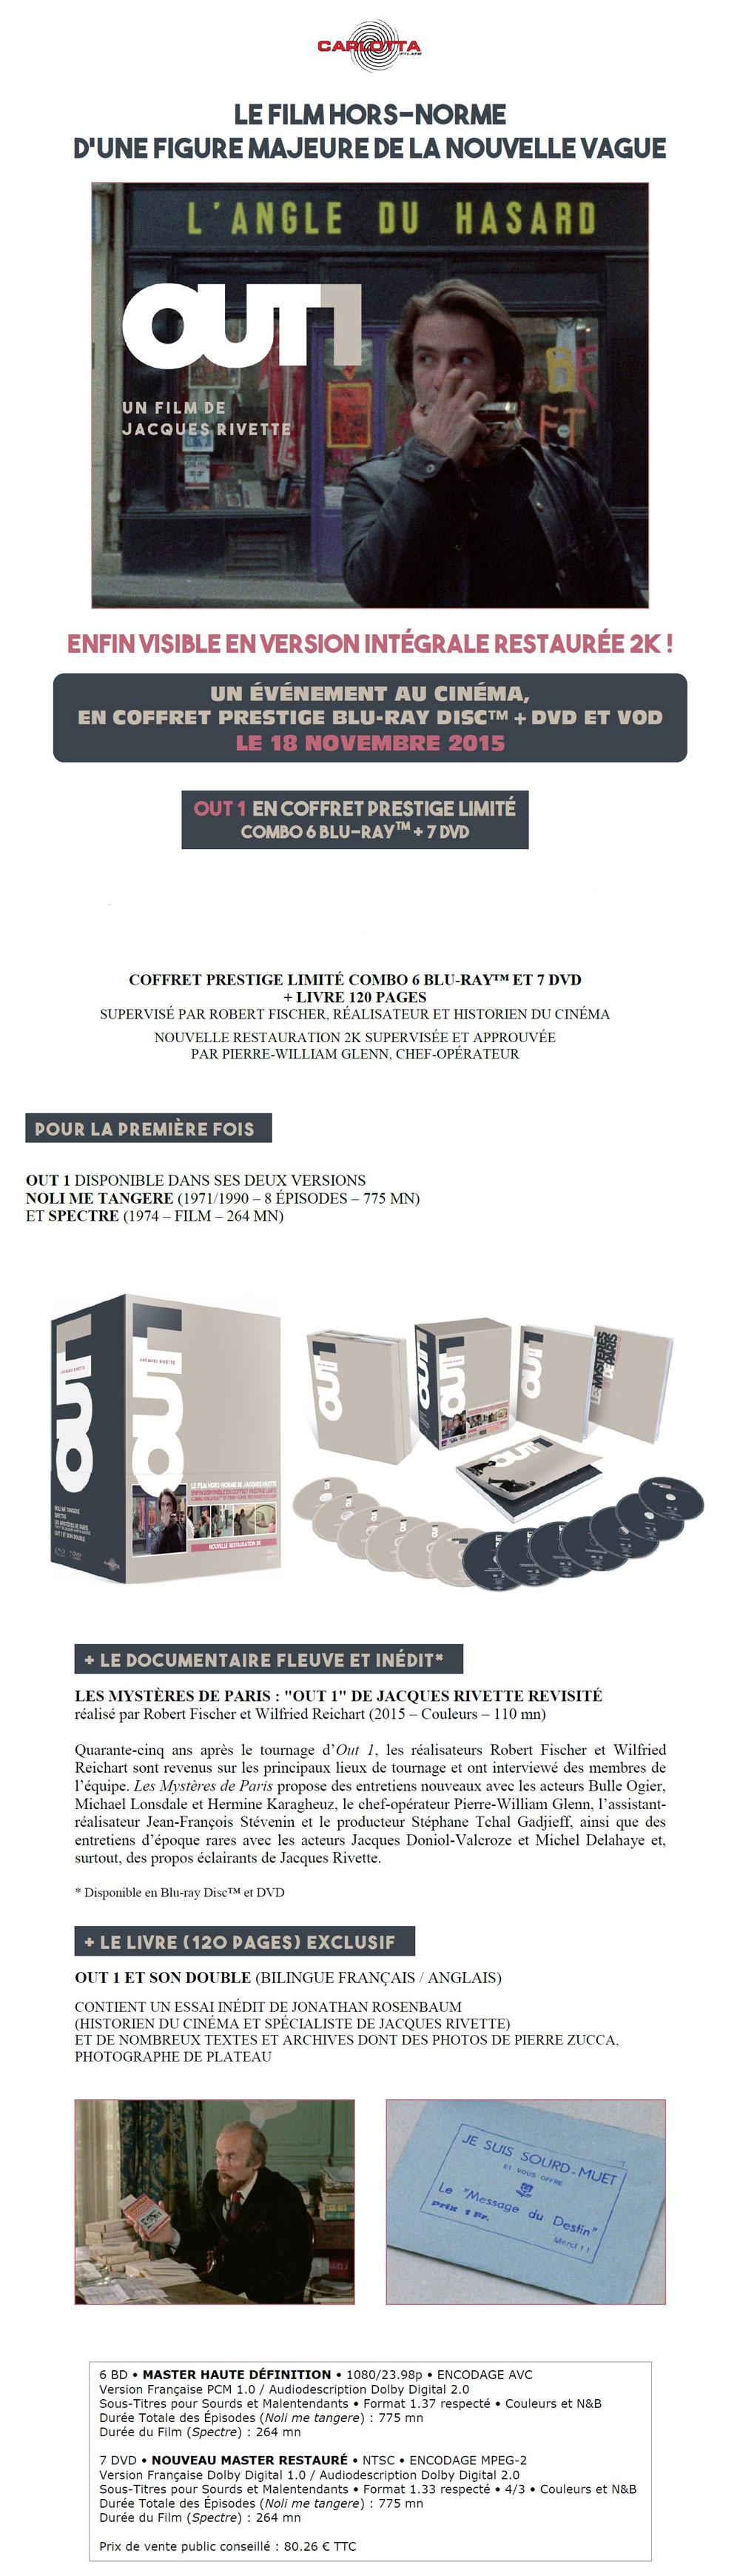 Out-1 - Annonce Presse Coffret Blu-ray